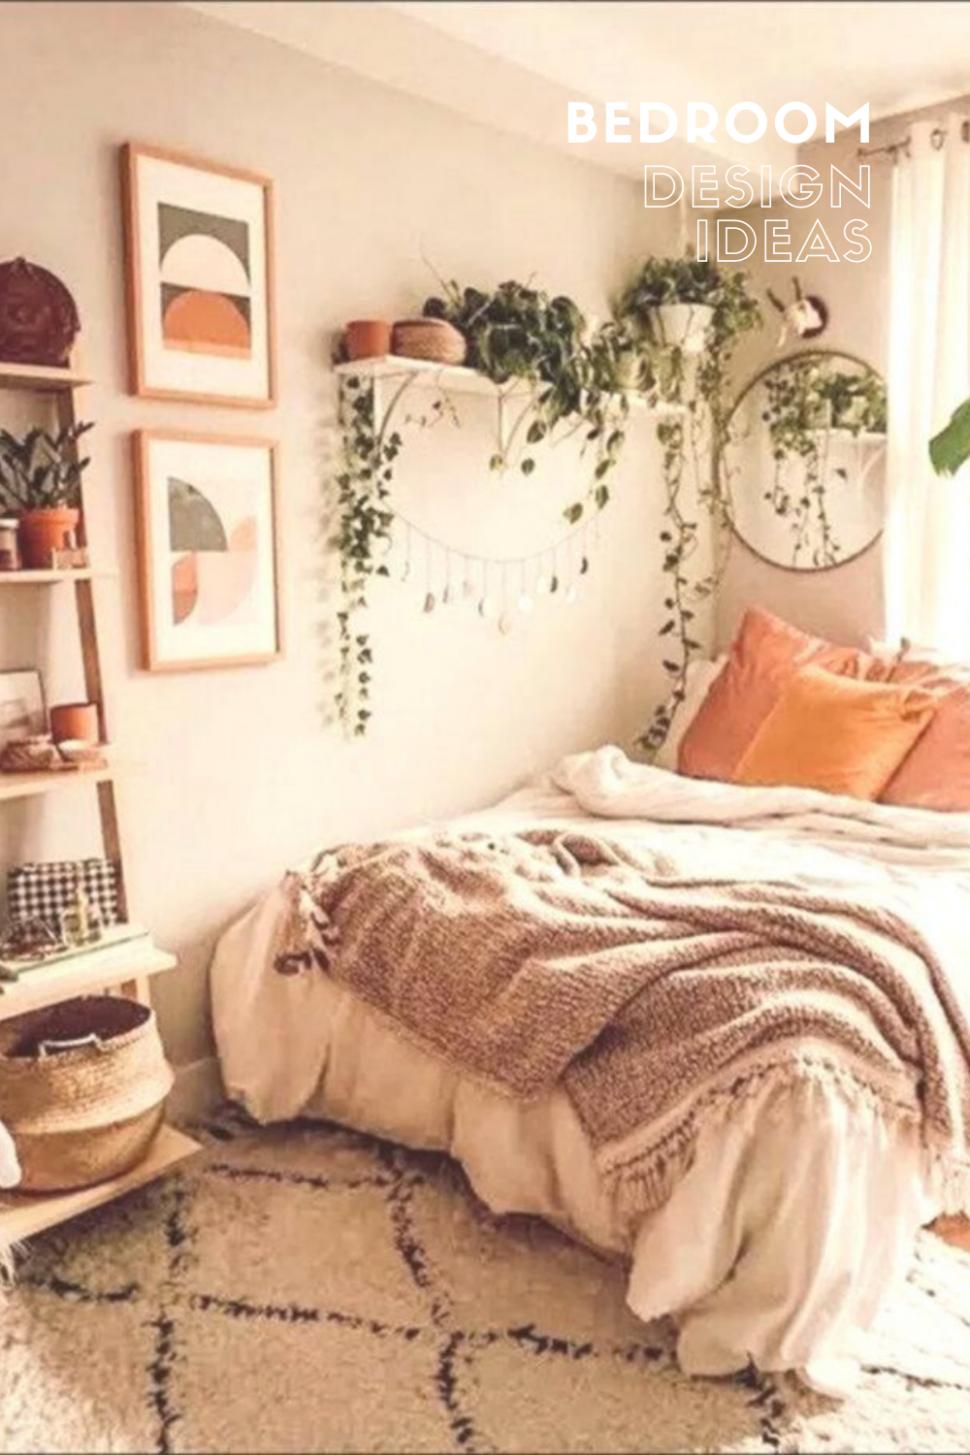 zen bedroom decor for sale #bedroom decor quiz buzzfeed #bedroom  - Bedroom Ideas Quiz